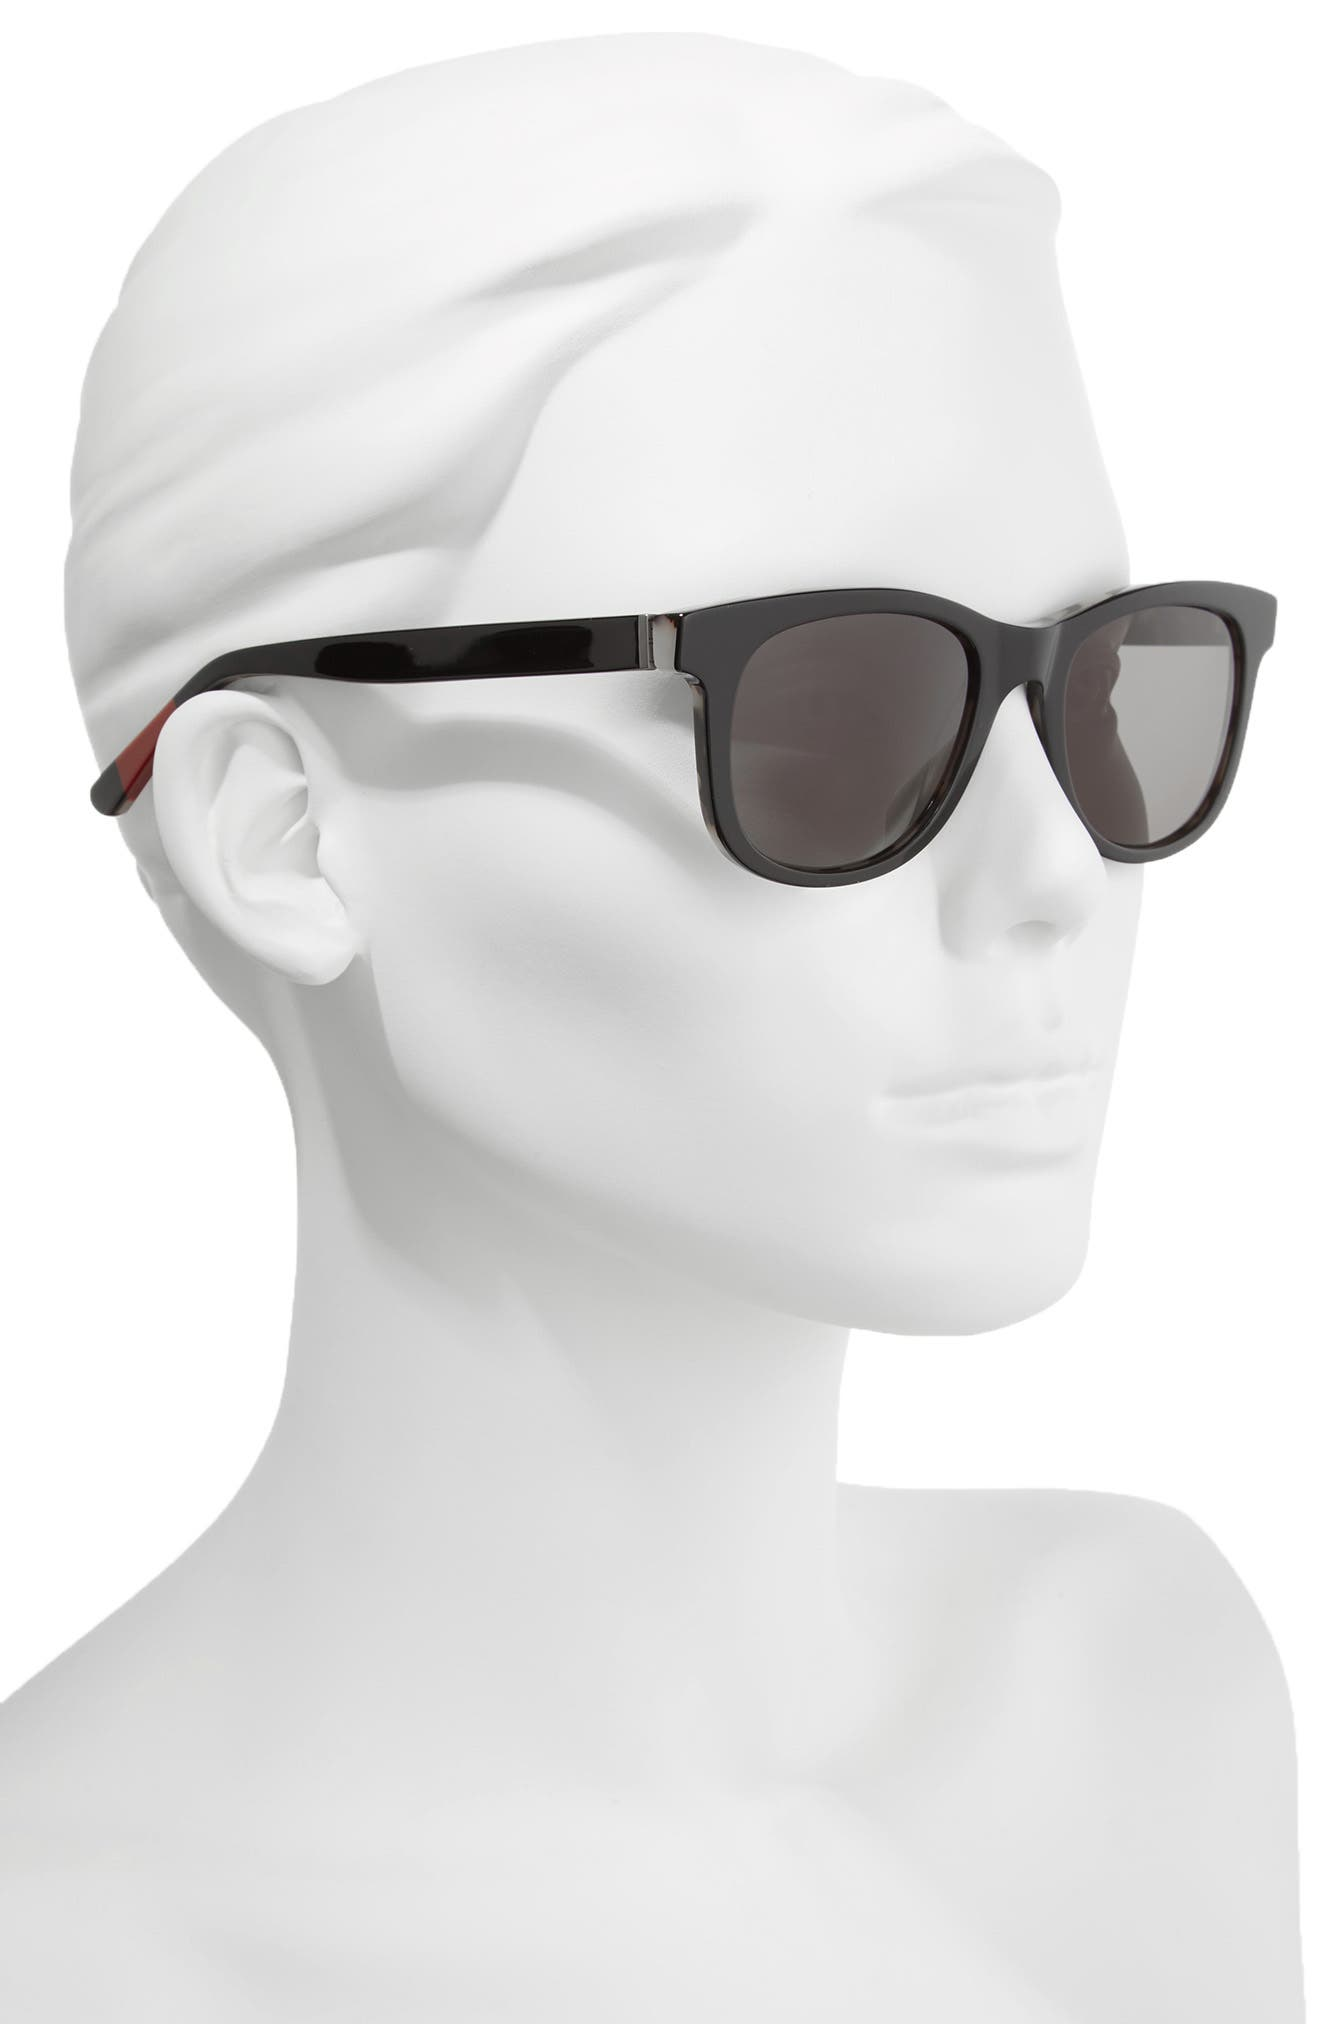 52mm Gradient Sunglasses,                             Alternate thumbnail 2, color,                             Black Tortoise